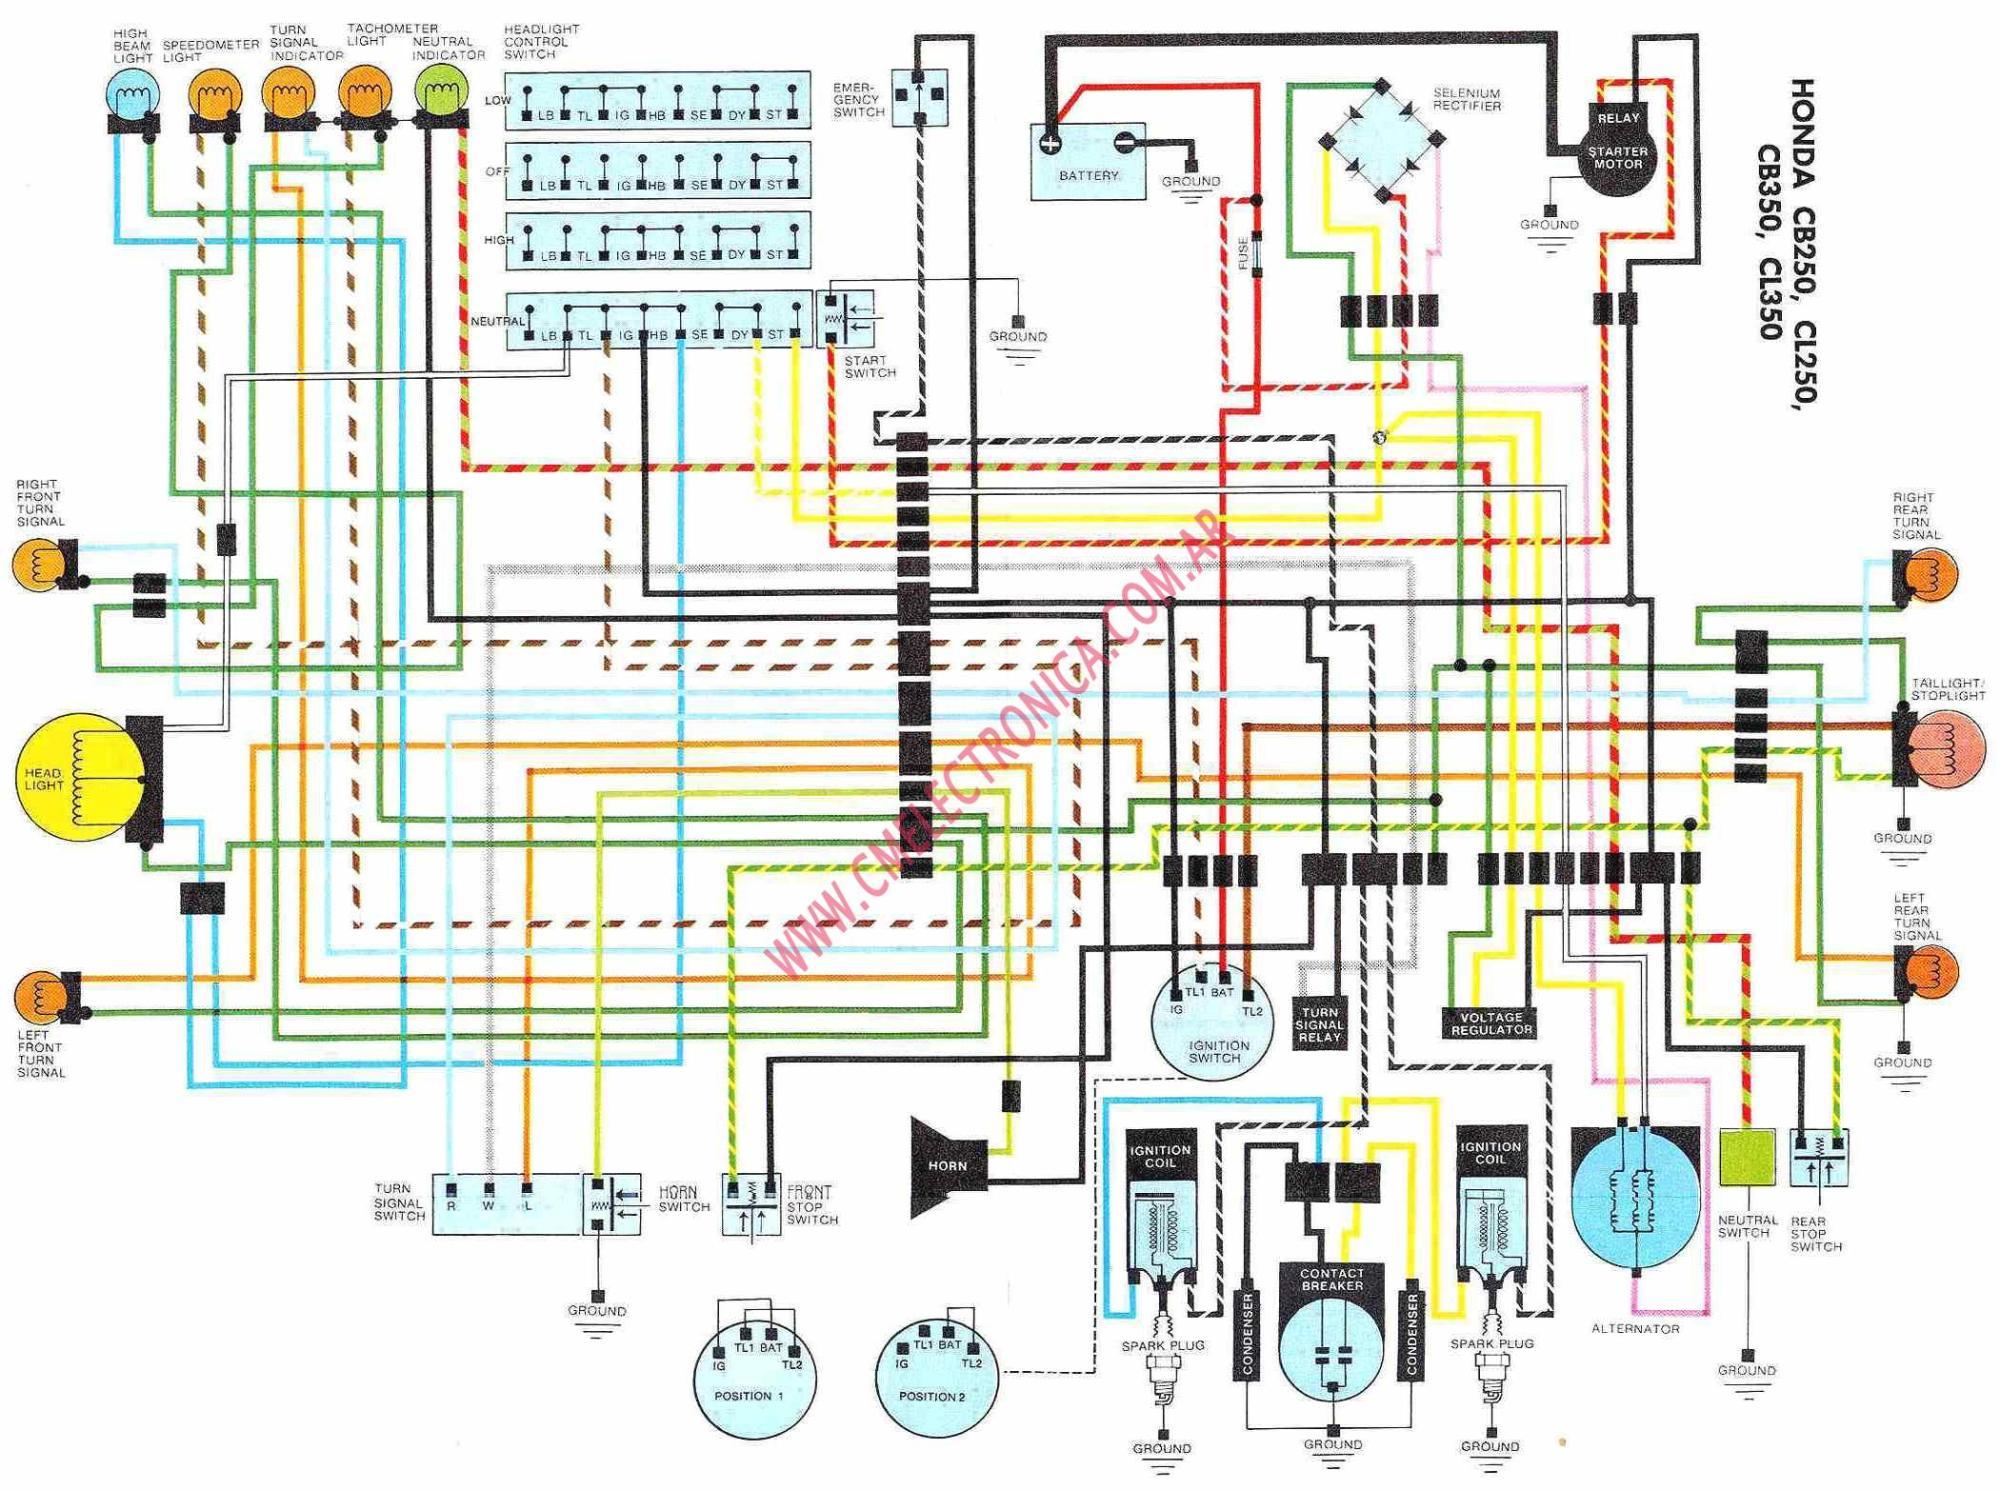 hight resolution of honda cb250 wiring diagram wiring diagram page honda cb250 wiring diagram wiring library honda cb250 wiring